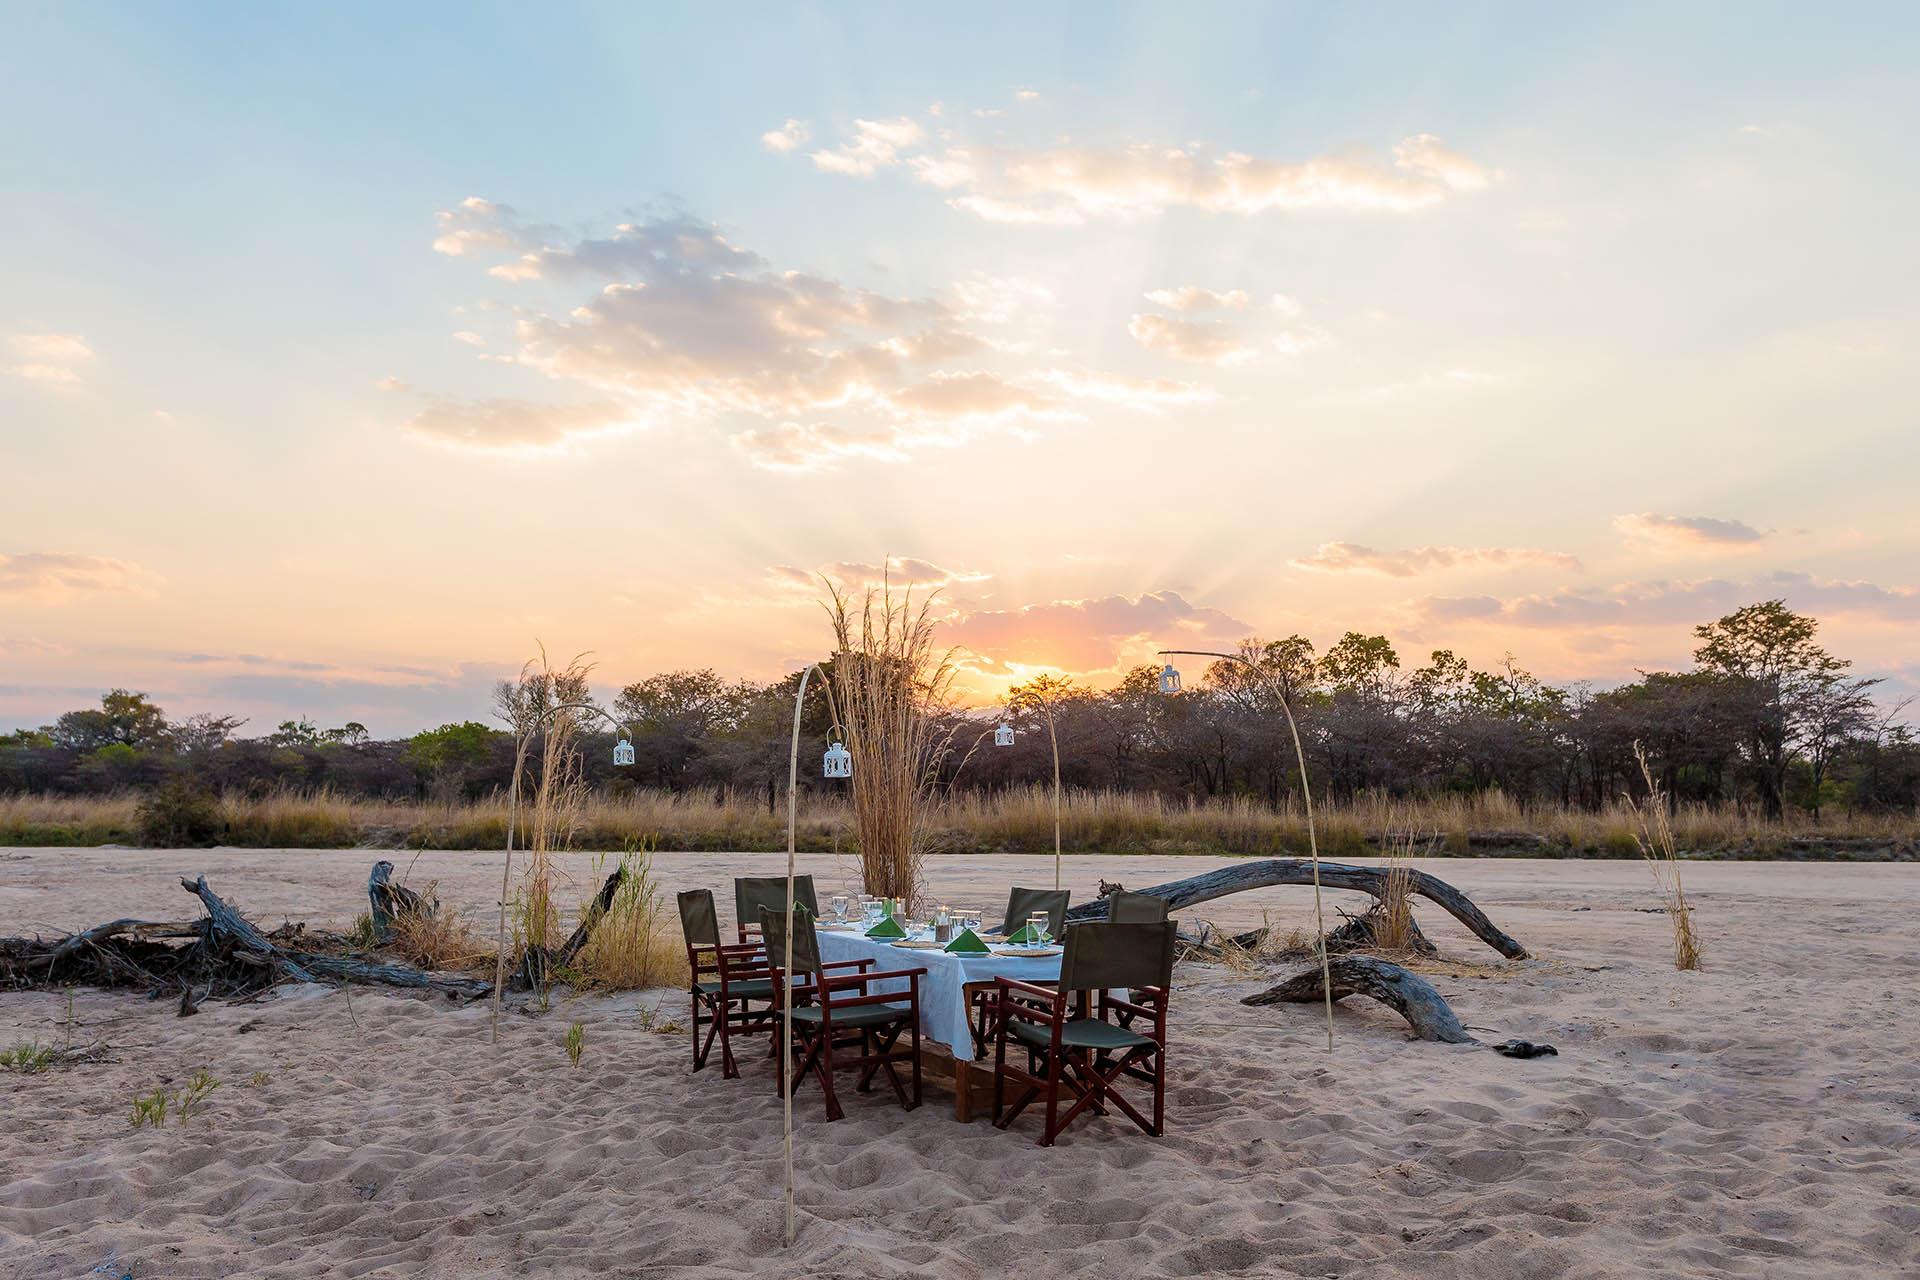 mount mulanje tours-malawian-style-malawi-adventures-experiences-specialist-tour-operator-nkonzi-camp-dinner